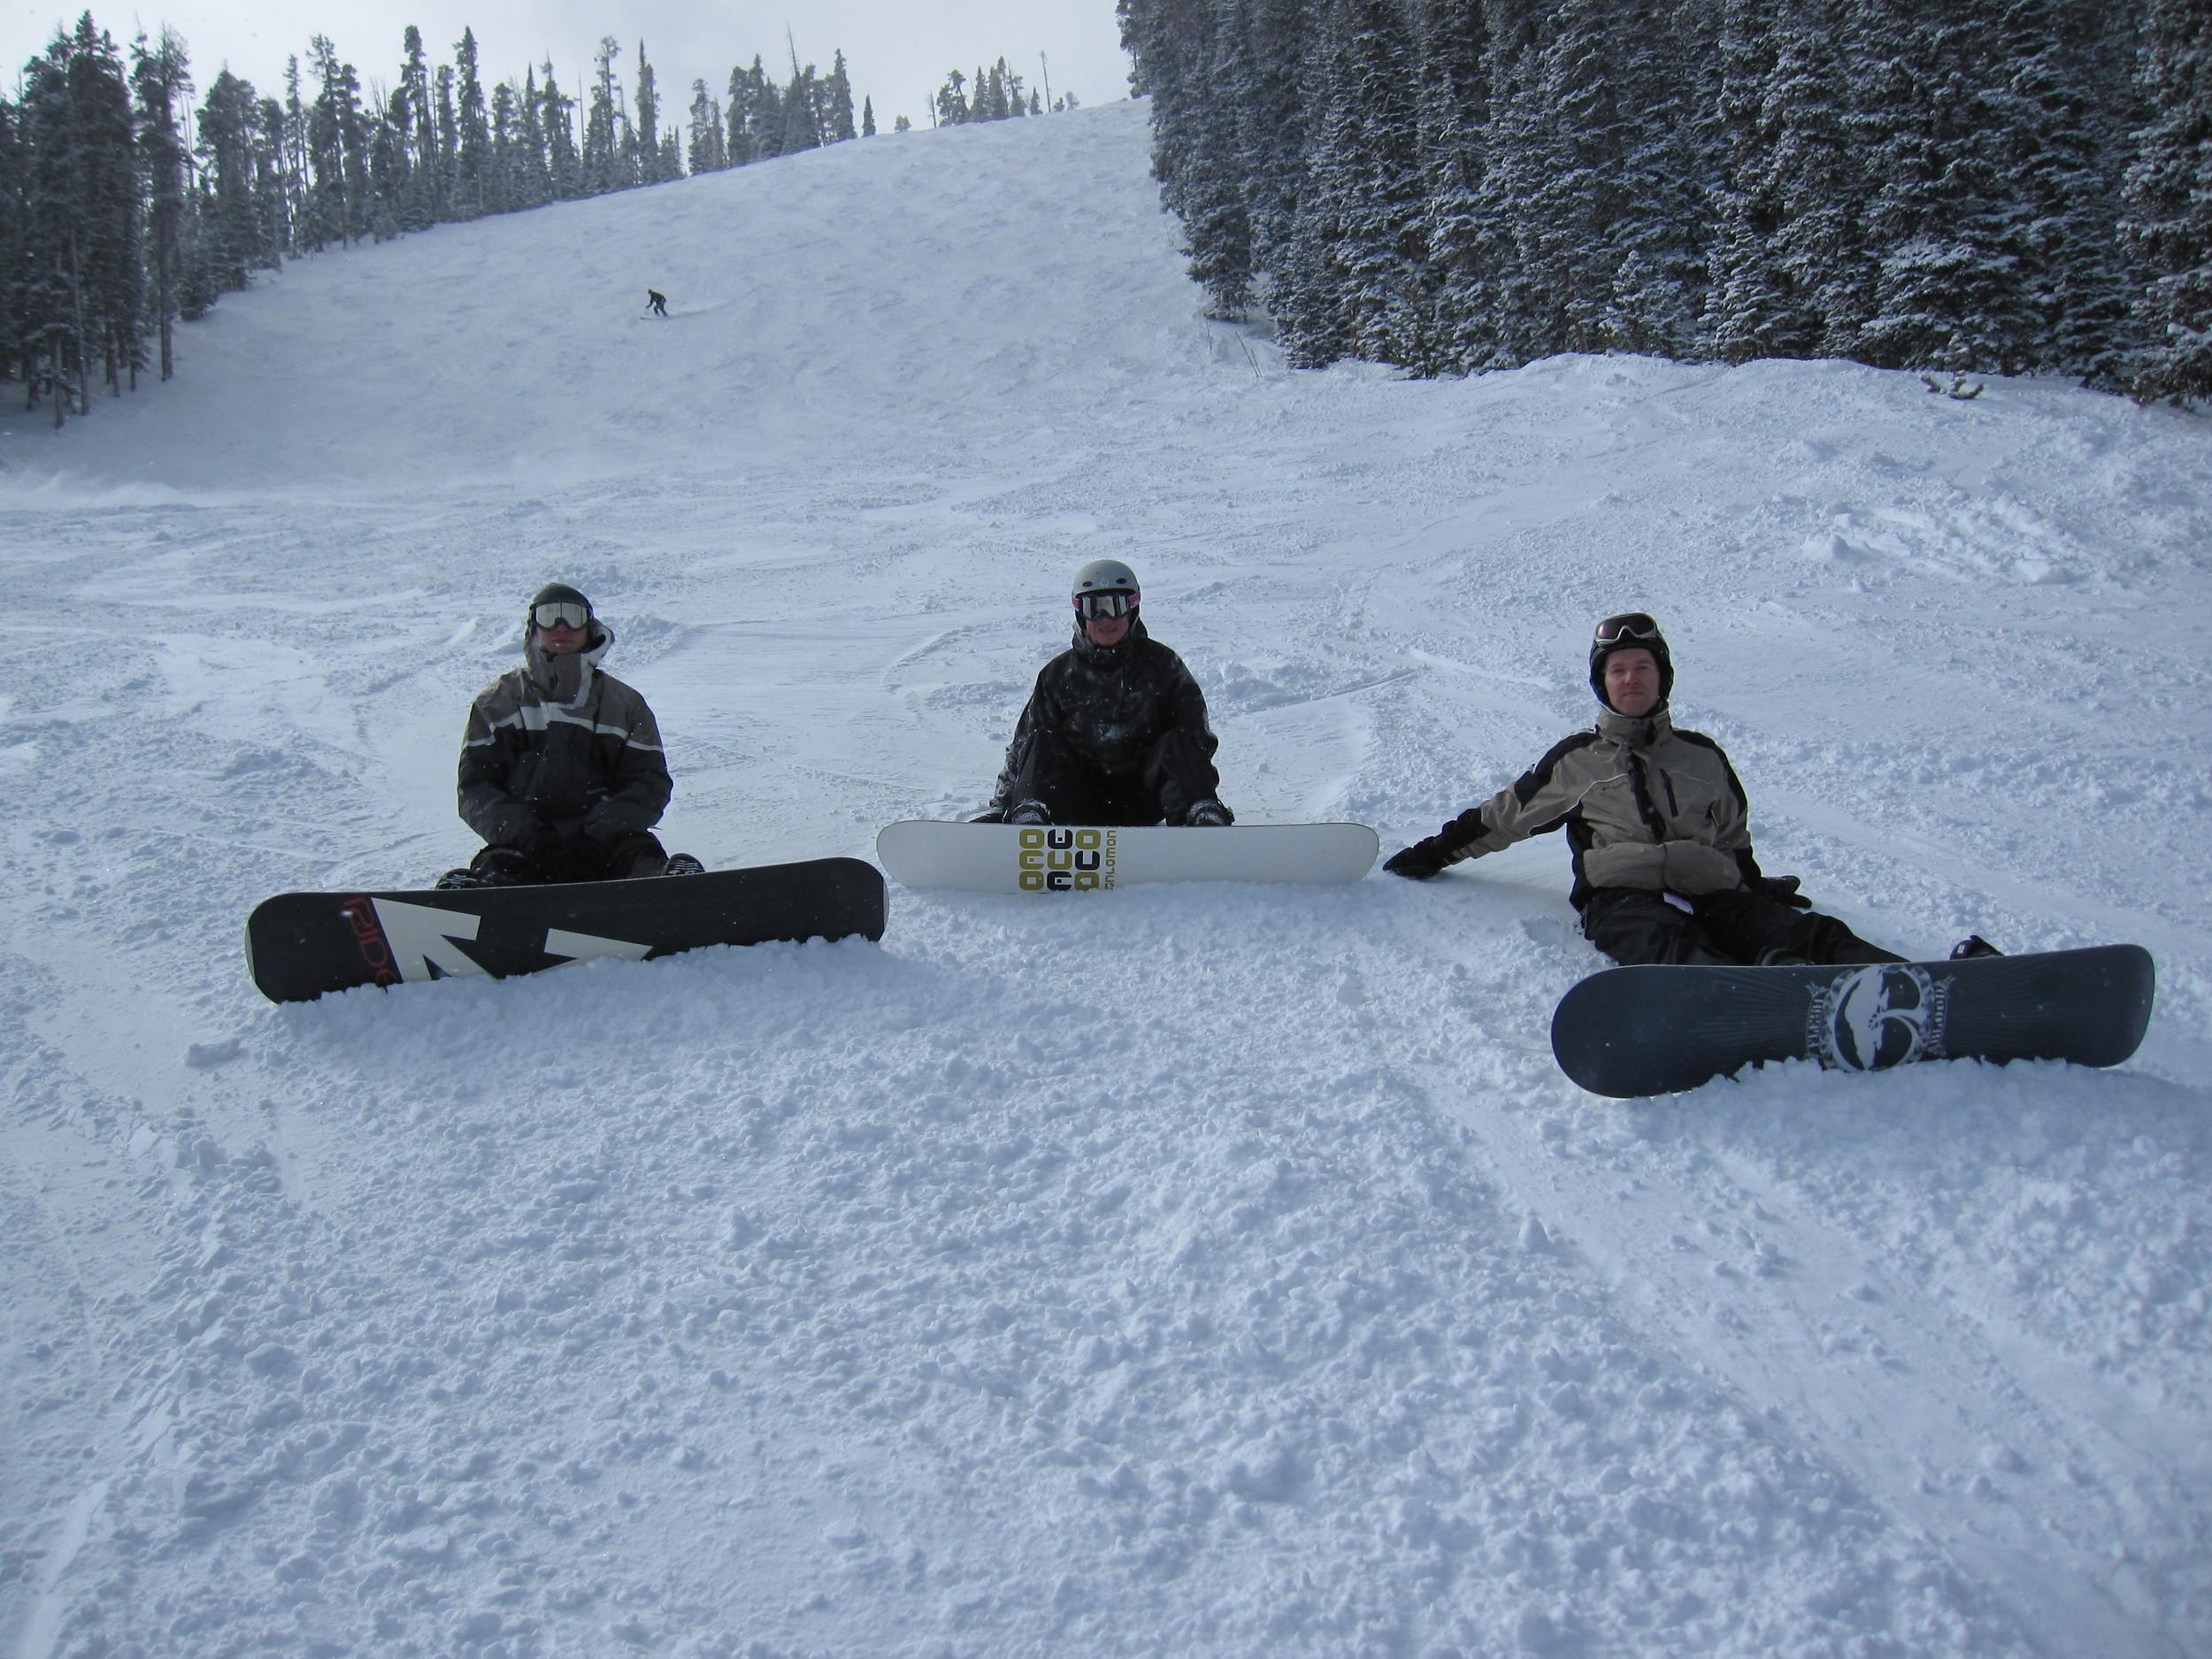 Snowboarding at Eldora Ski Resort (photo courtesy of Darrell Newberry)